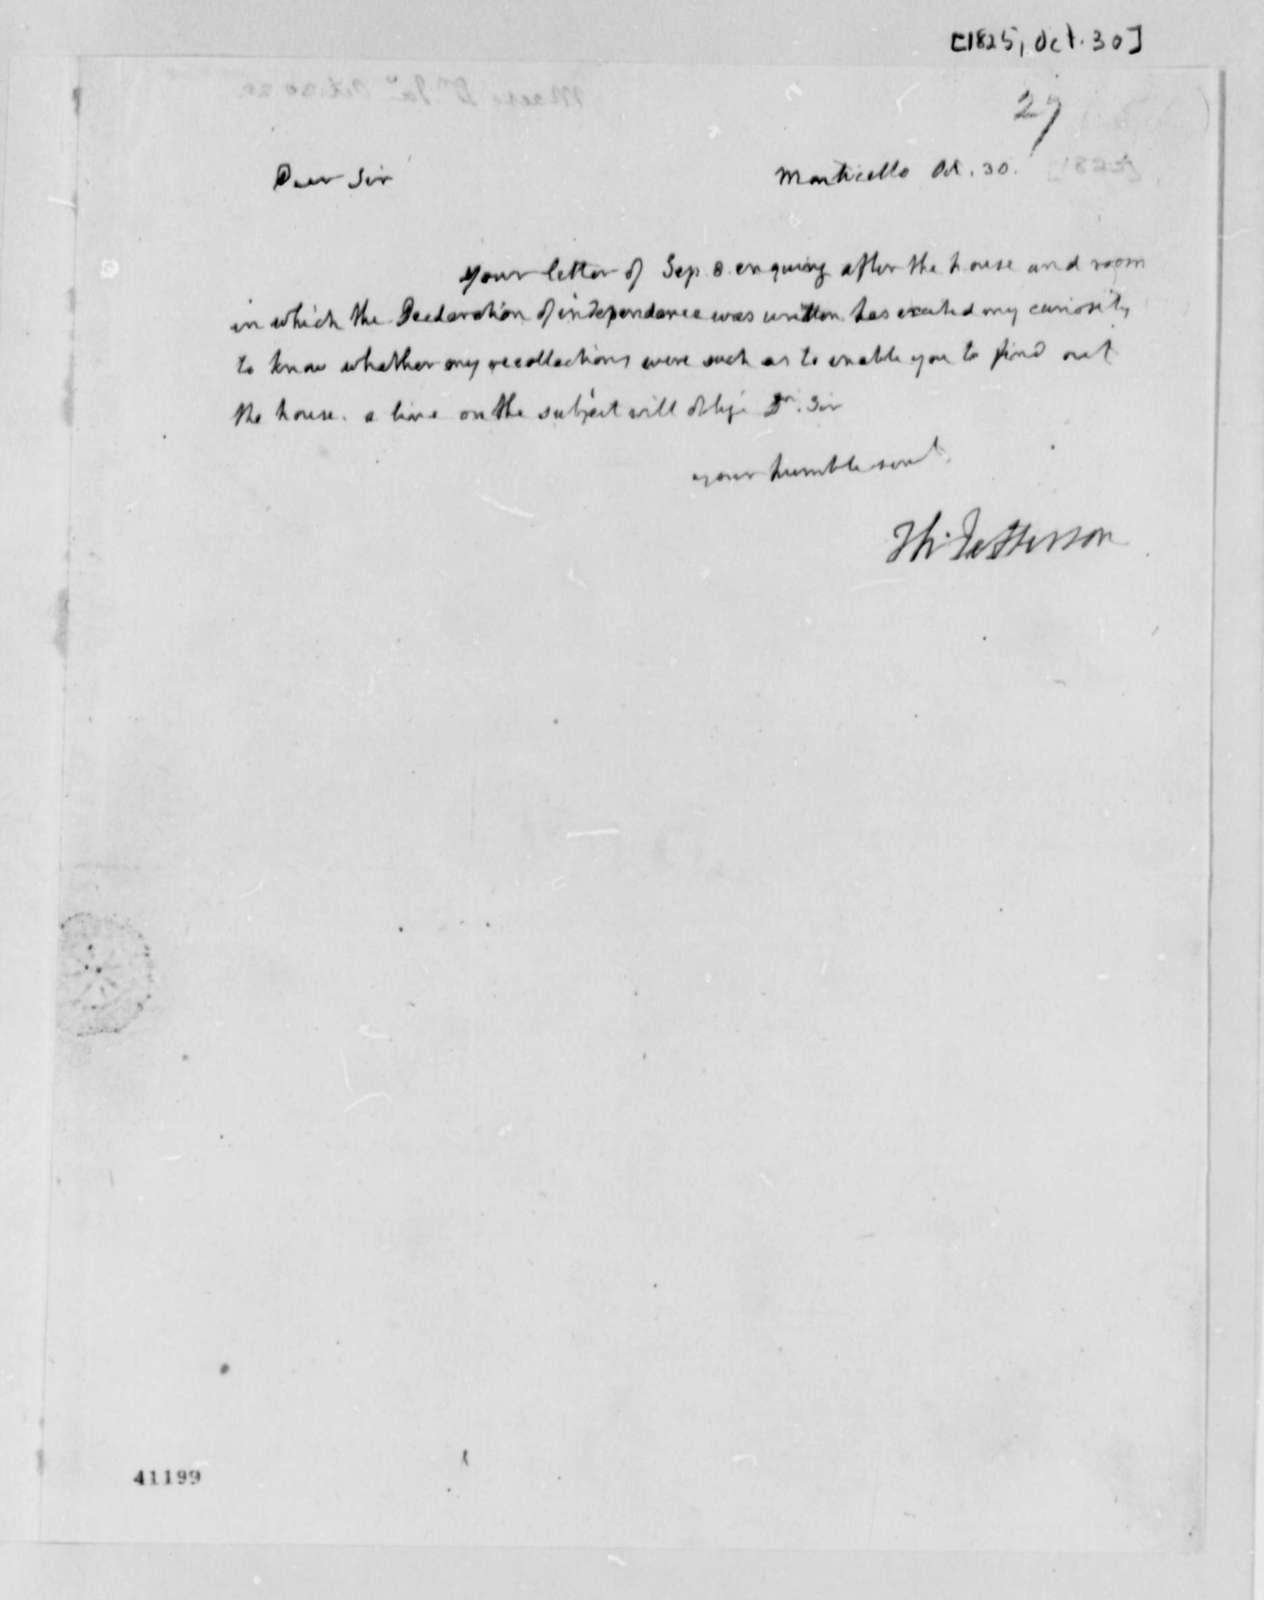 Thomas Jefferson to James Mease, October 30, 1825